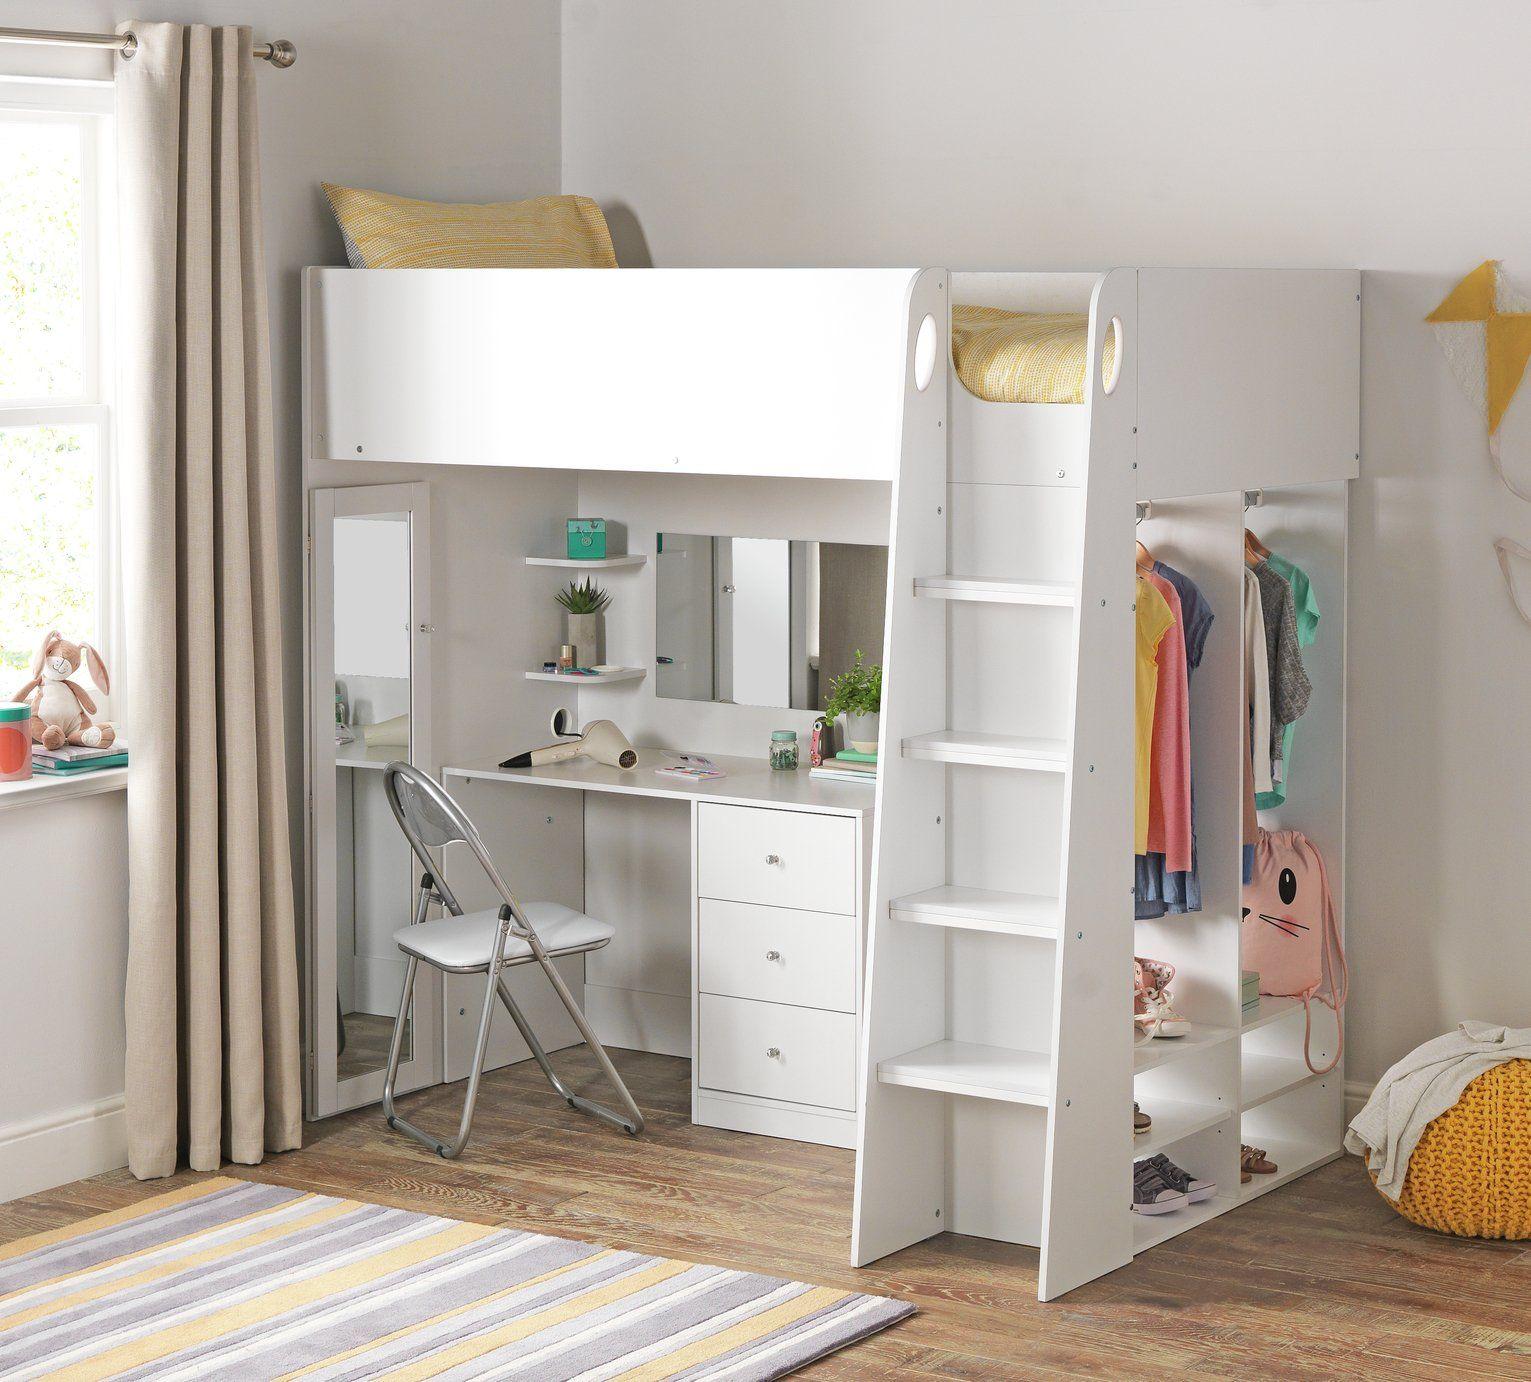 Buy Argos Home Glam High Sleeper Bed Frame White Kids Beds In